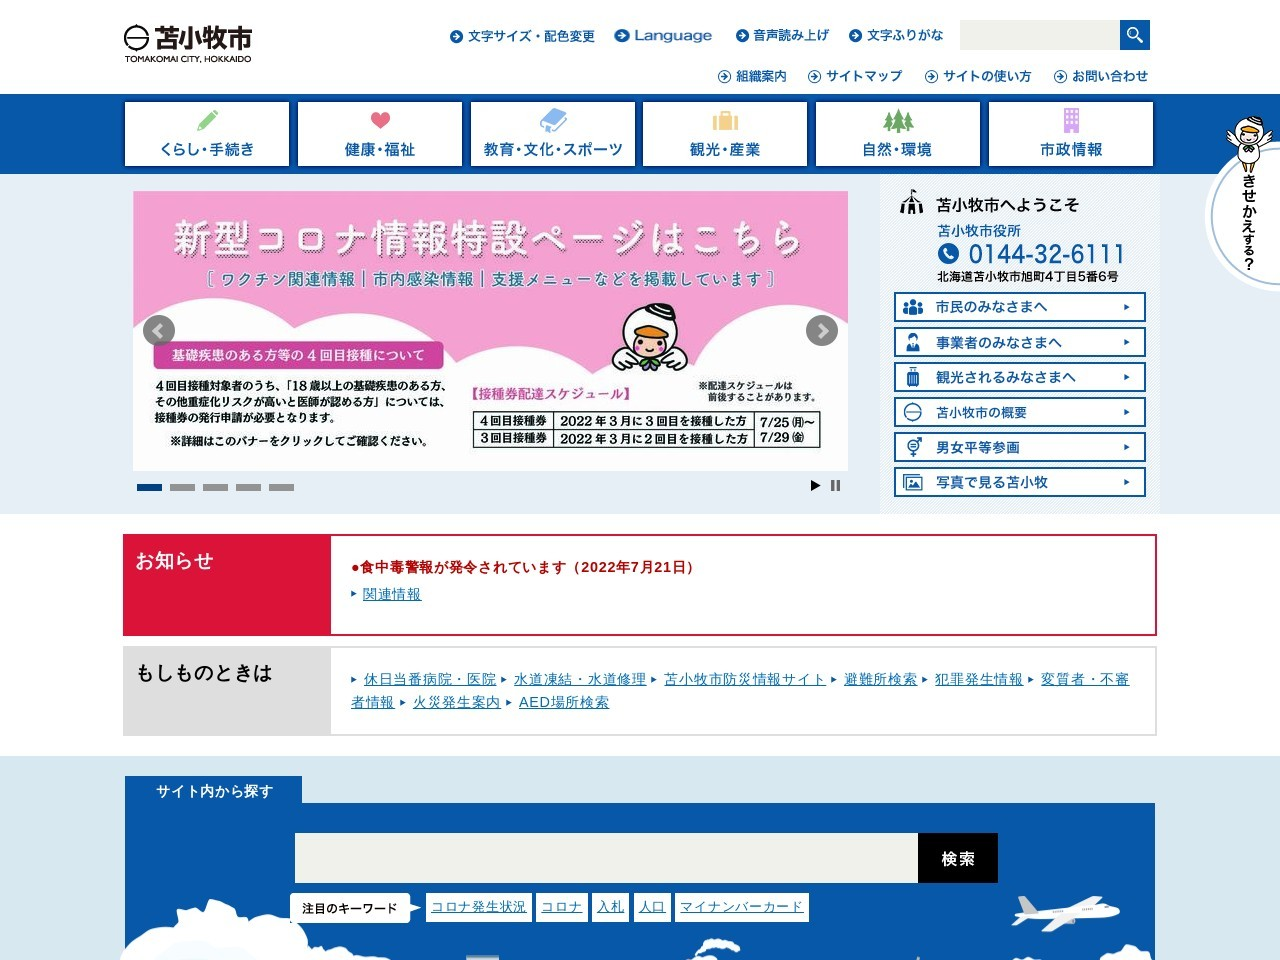 http://www.city.tomakomai.hokkaido.jp/hakubutsukan/tokan/facebook.html